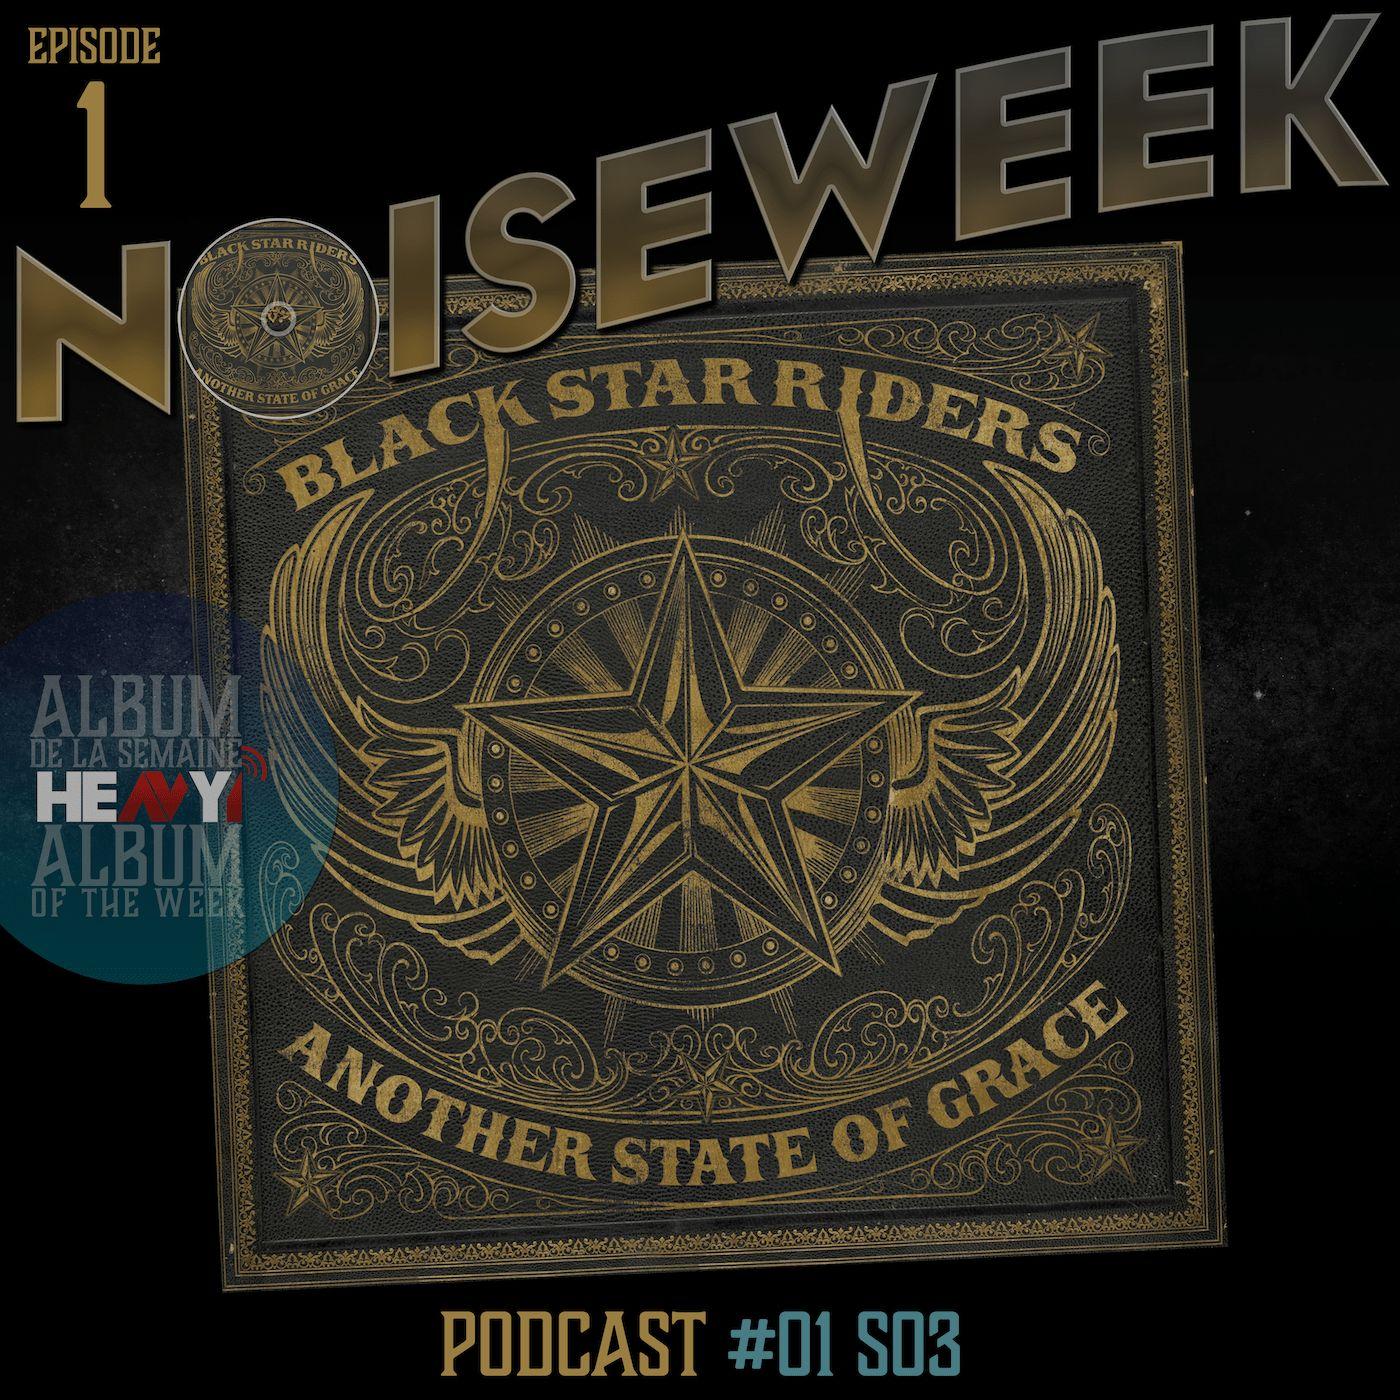 Noiseweek #01 Saison 3